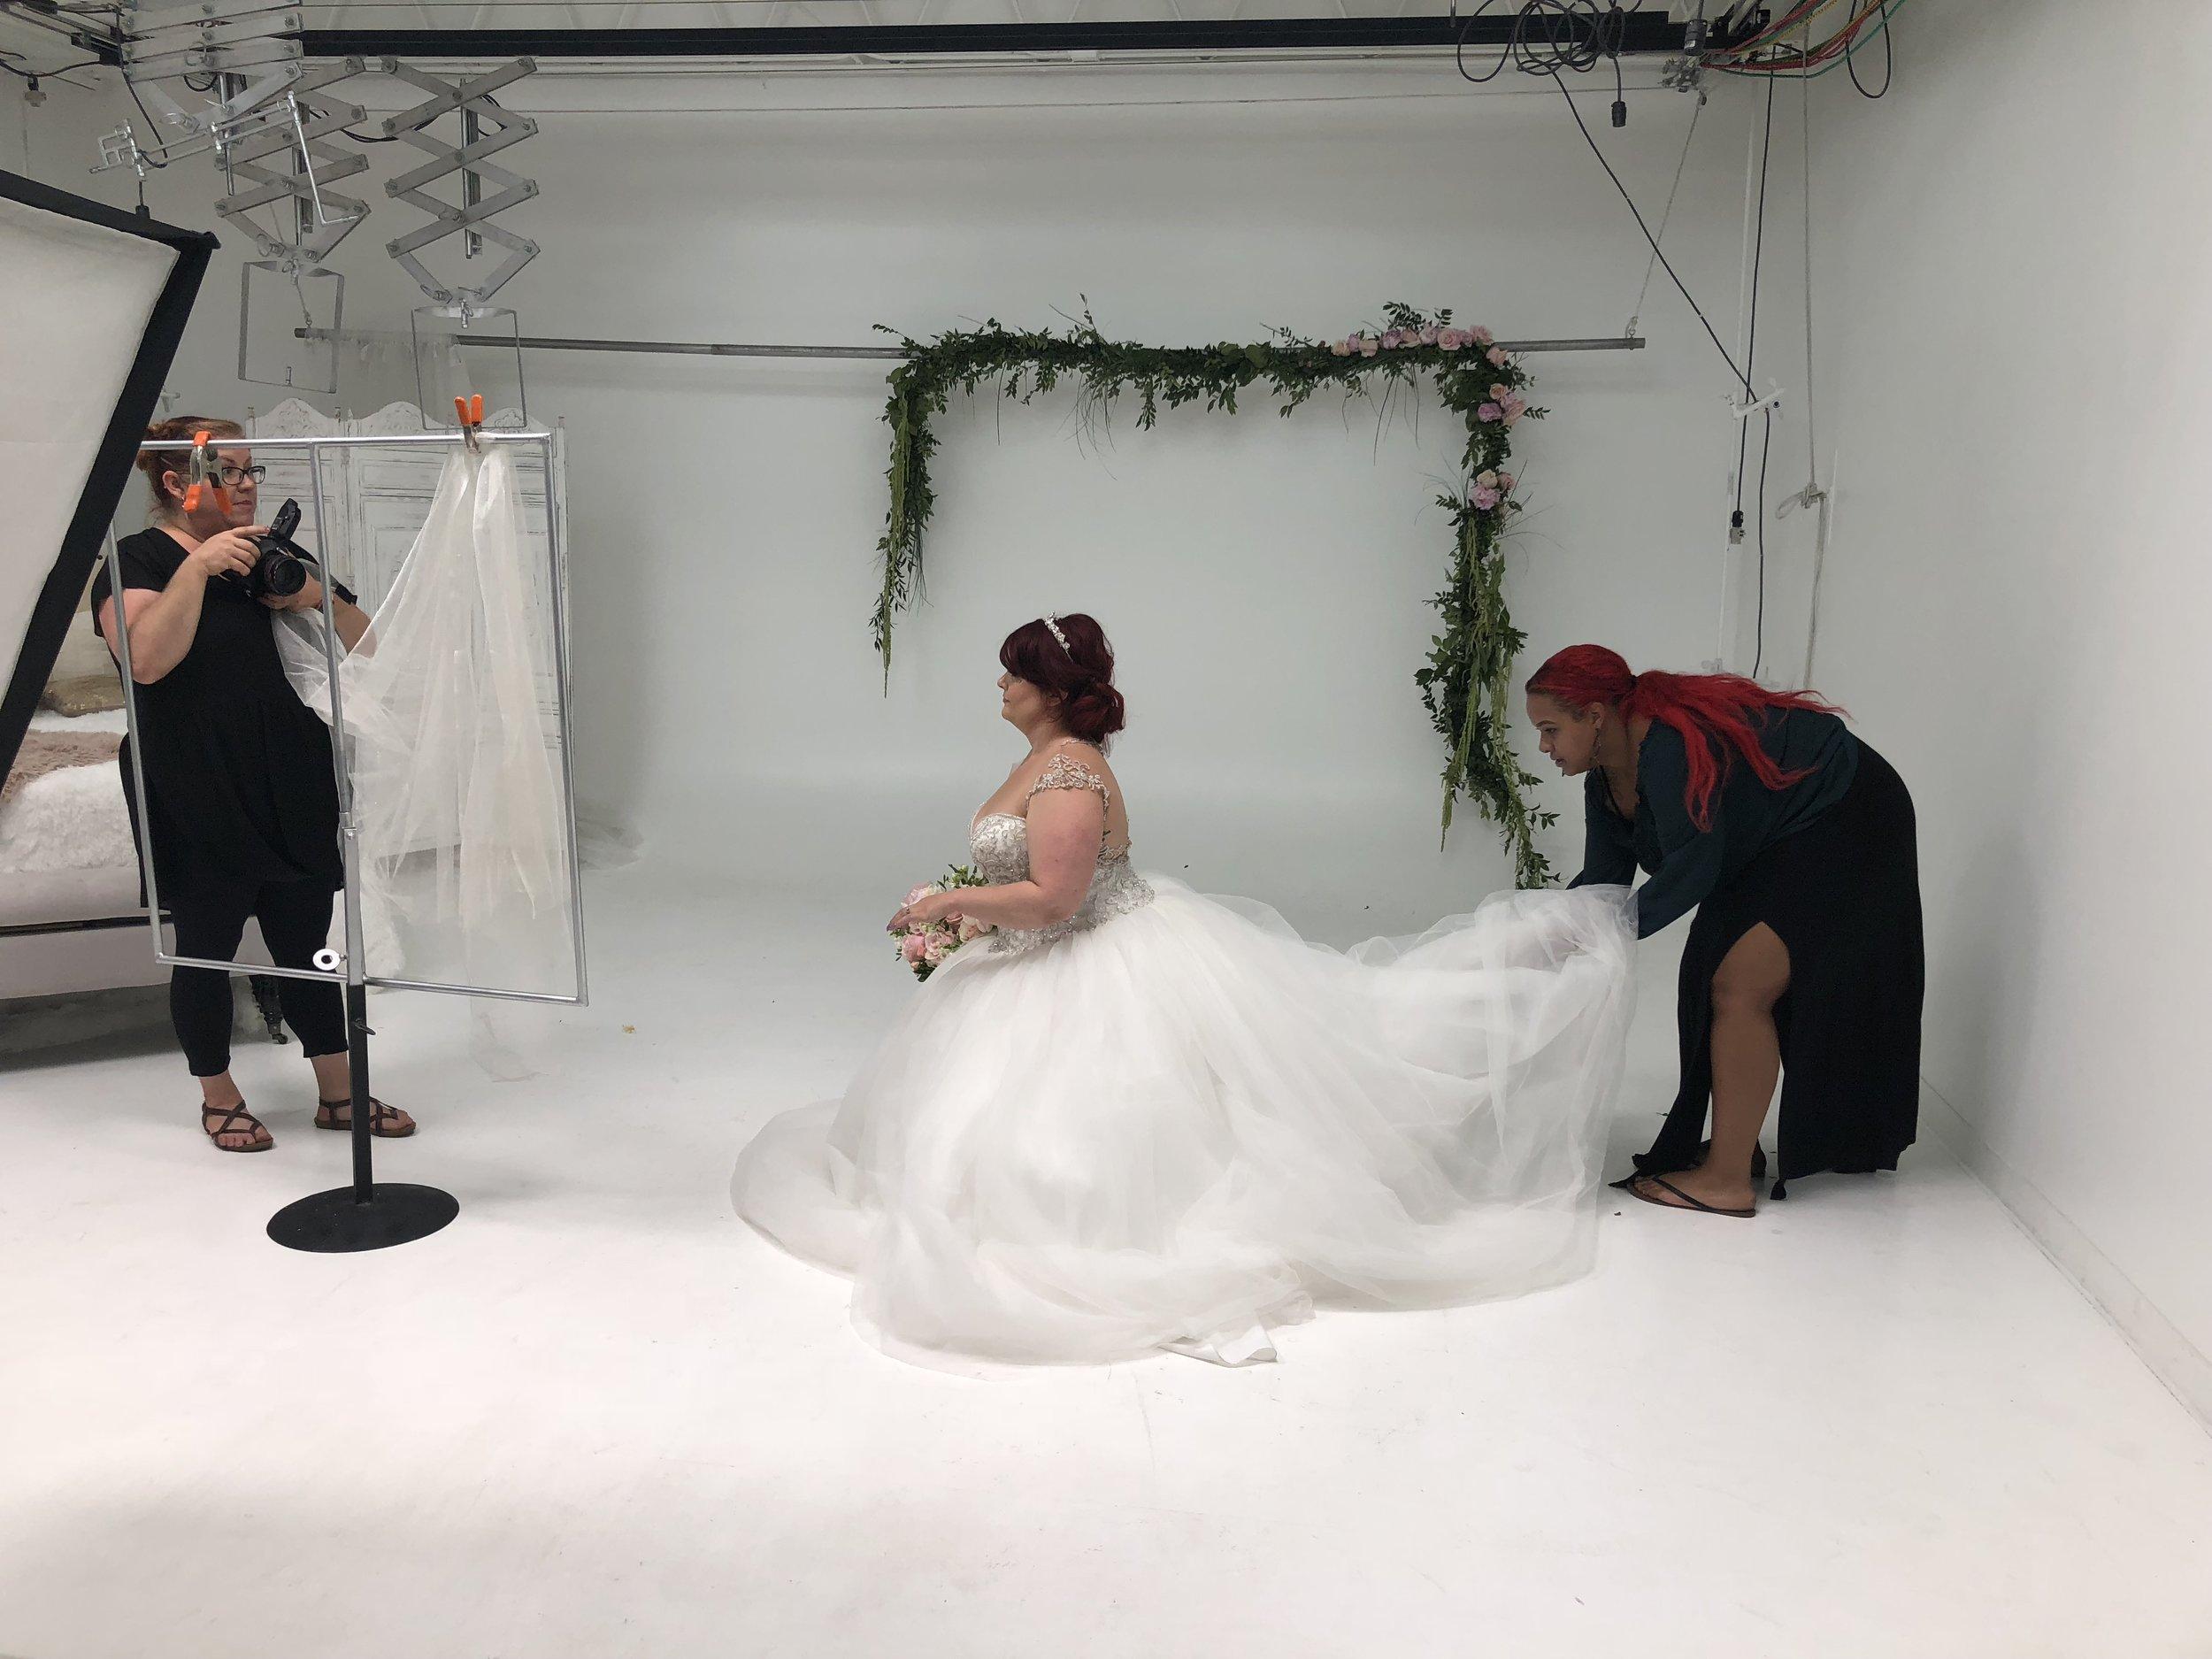 uptown Bride fashion shoot 8.jpg